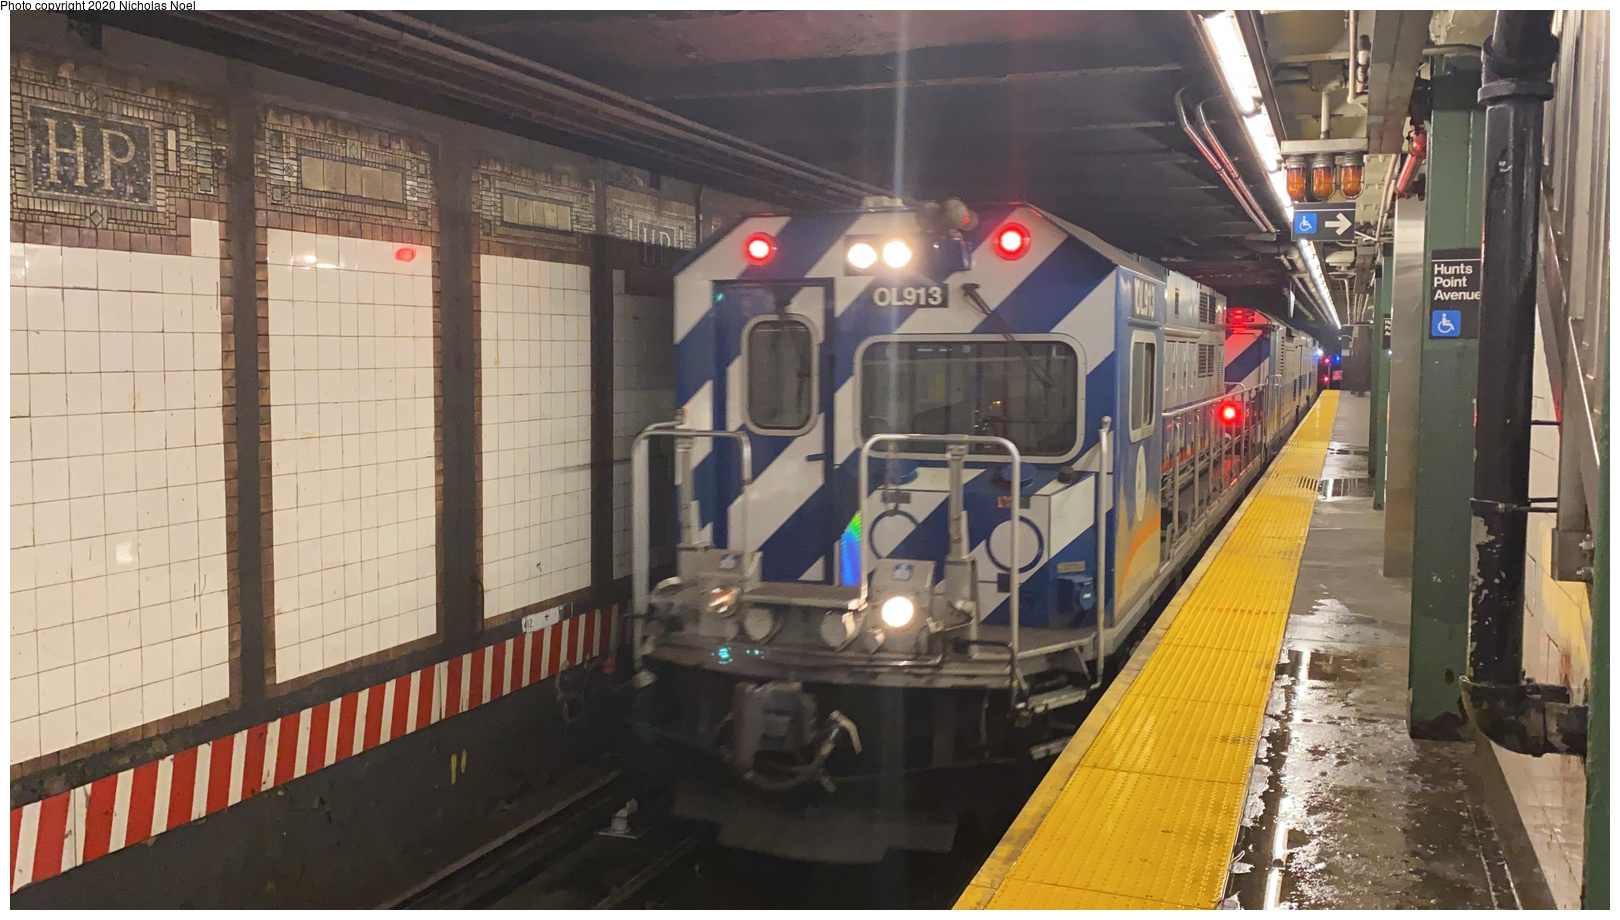 (496k, 1620x920)<br><b>Country:</b> United States<br><b>City:</b> New York<br><b>System:</b> New York City Transit<br><b>Line:</b> IRT Pelham Line<br><b>Location:</b> Hunts Point Avenue <br><b>Route:</b> Work Service<br><b>Car:</b> R-156 Diesel-Electric Locomotive (MPI, 2012-2013) 913 <br><b>Photo by:</b> Nicholas Noel<br><b>Date:</b> 1/28/2020<br><b>Viewed (this week/total):</b> 13 / 42